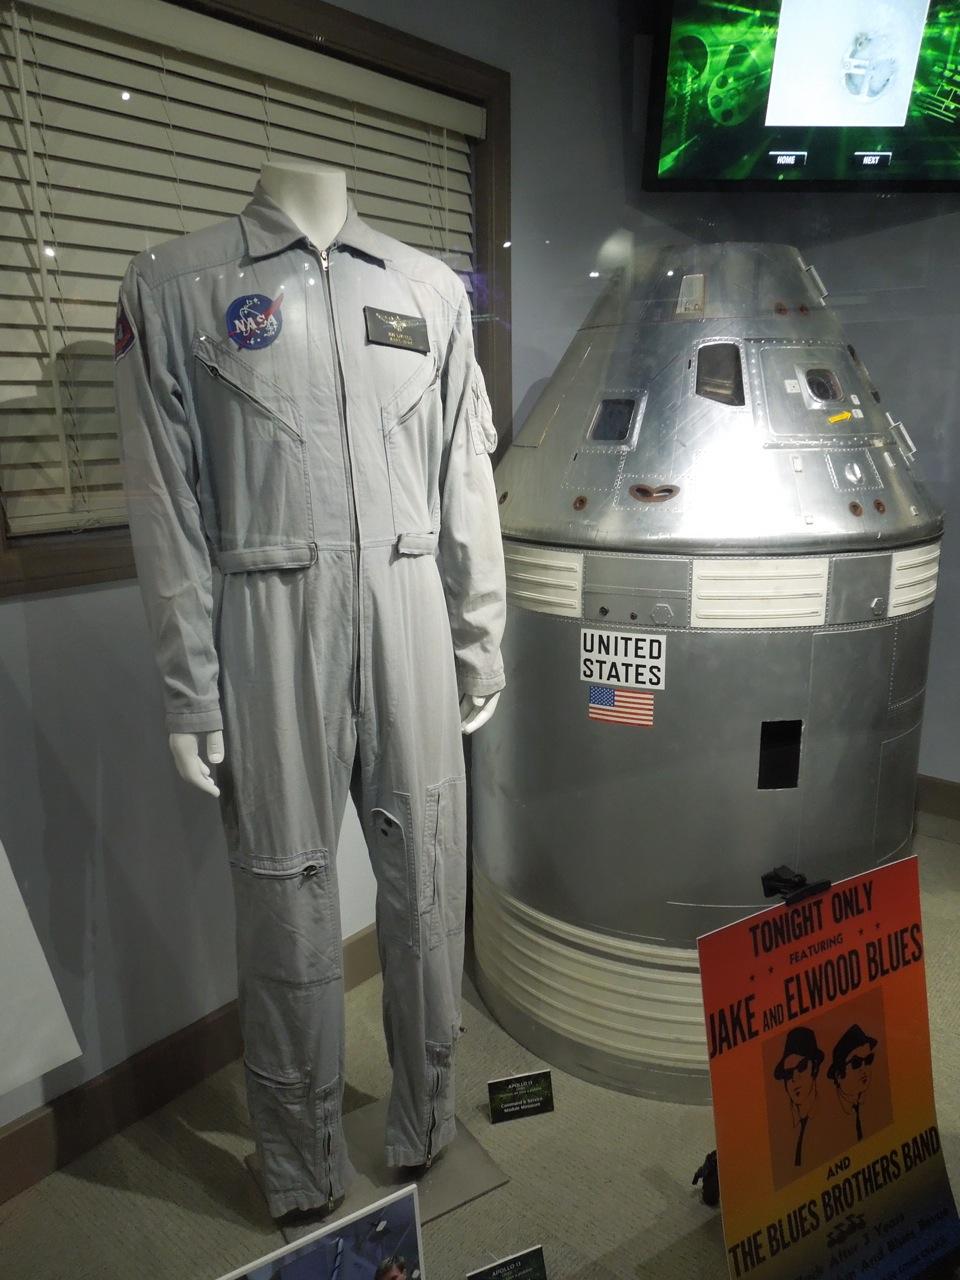 Tom Hanks NASA jumpsuit and Apollo 13 model miniatures on